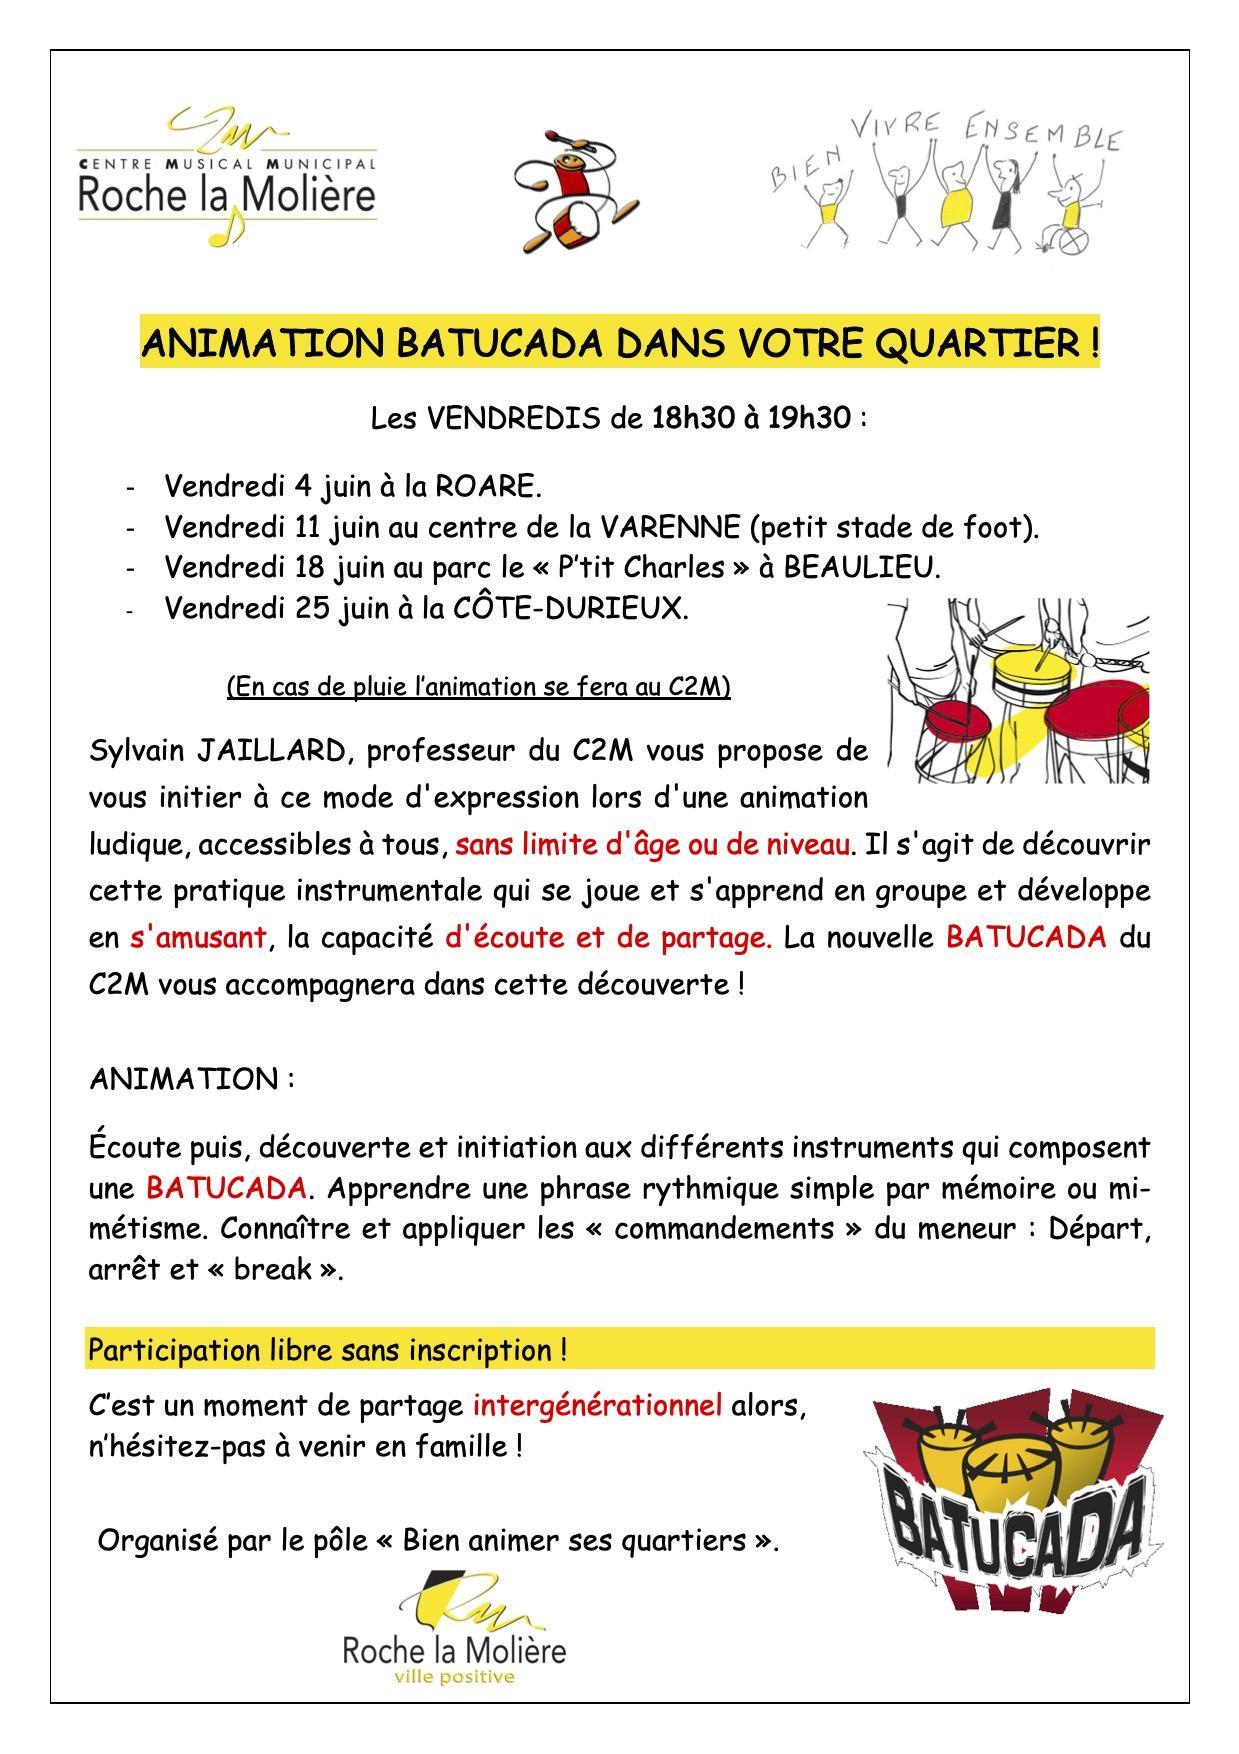 Projet batucada quartiers juin 2021 word